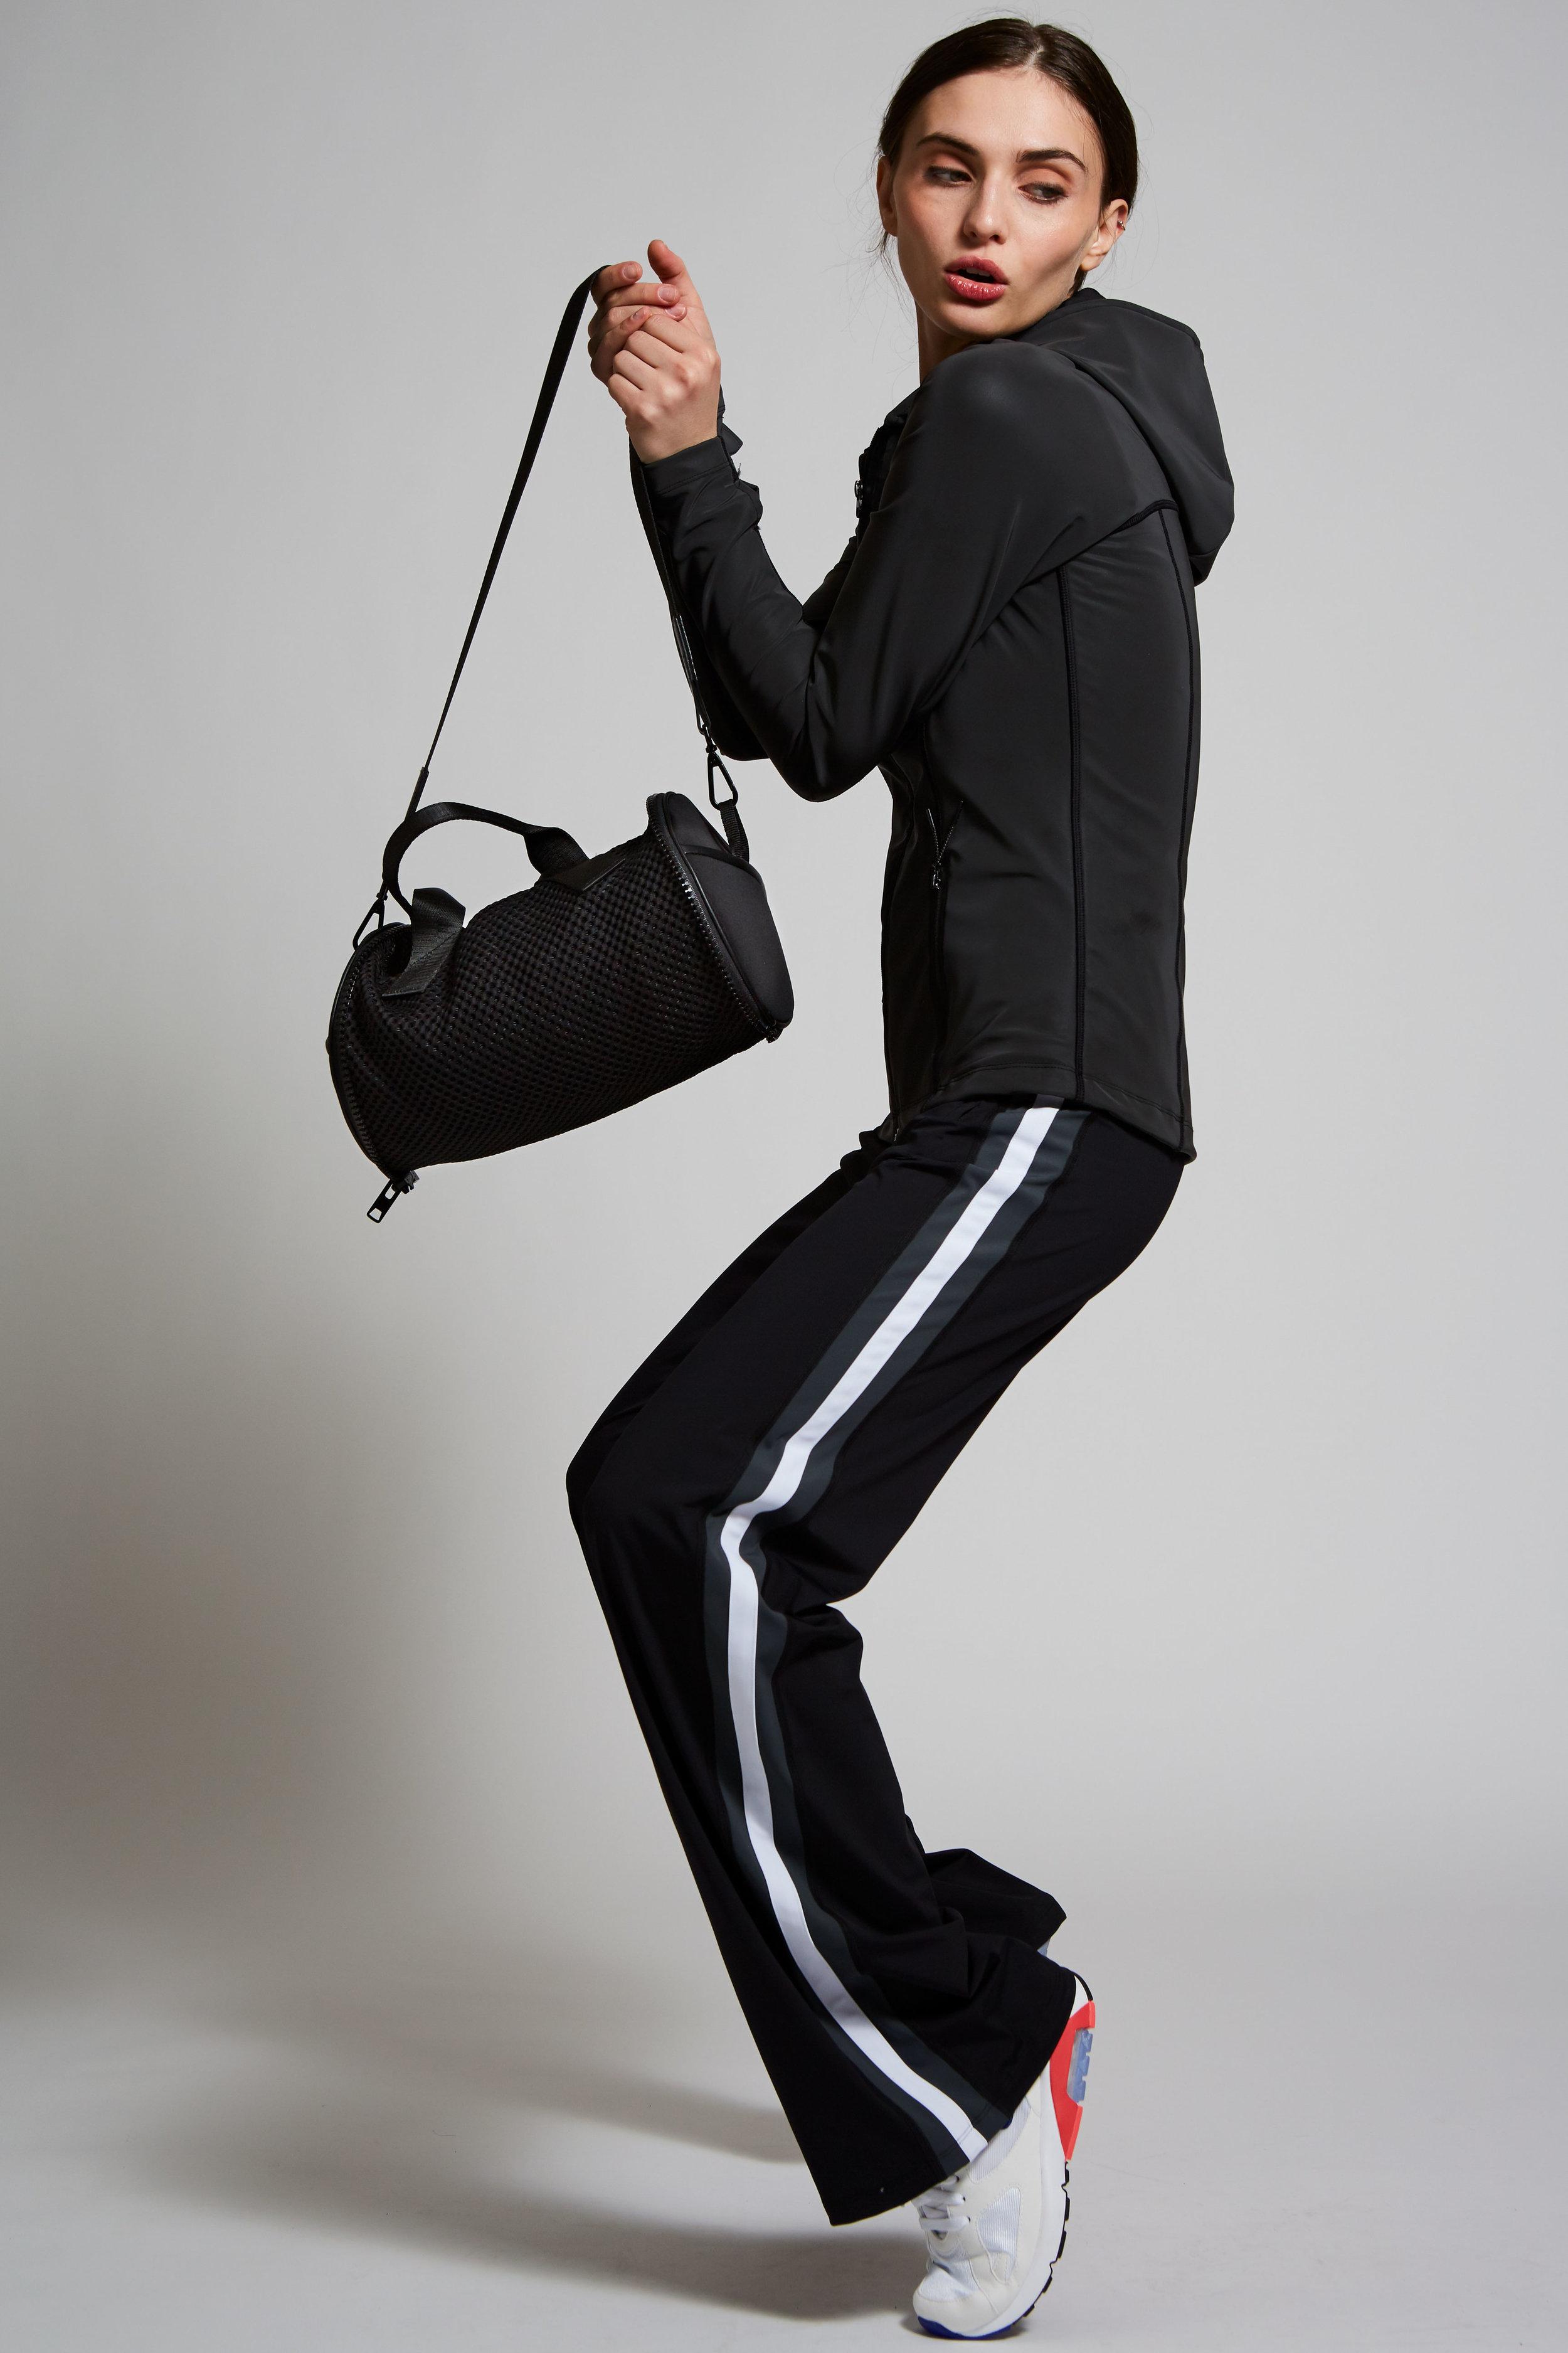 mini-duffle-bag.jpg